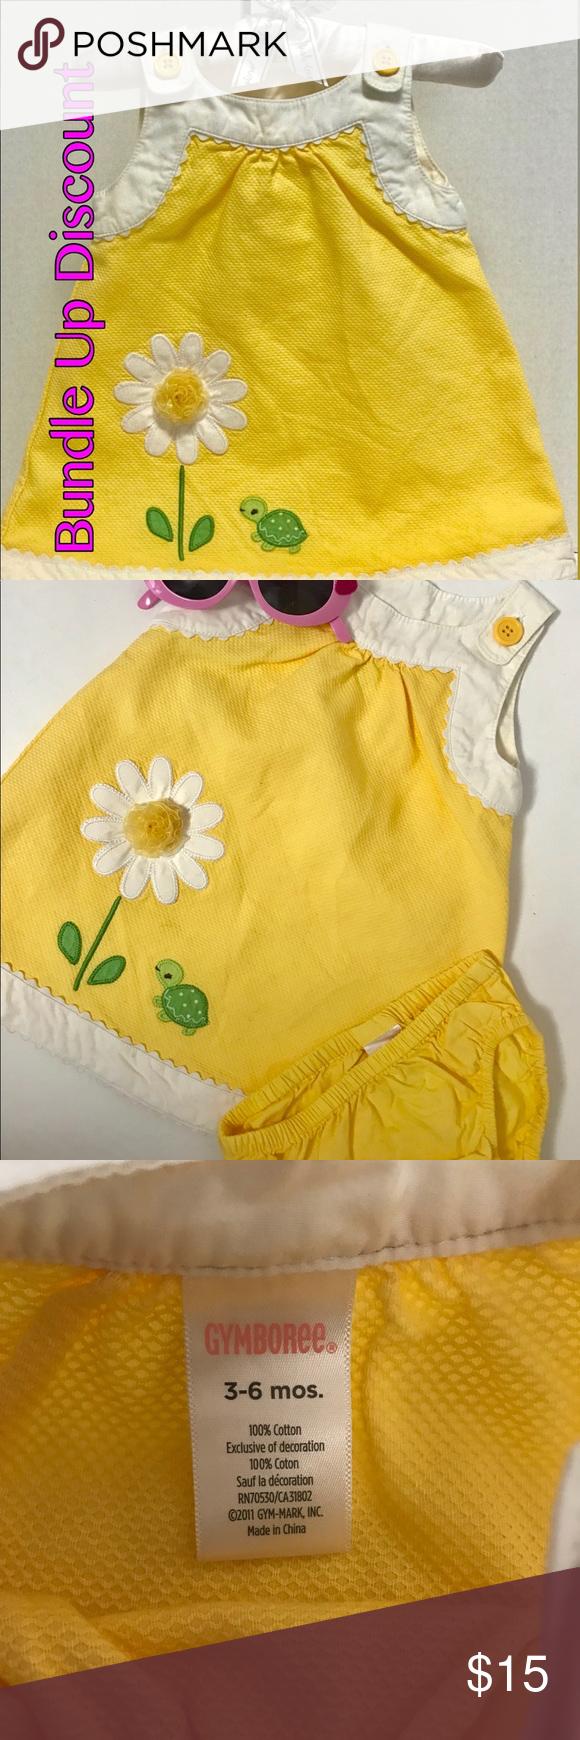 Yellow dress 3-6 months  Gymboree Summer Yellow Girl Dress  My Posh Picks  Pinterest